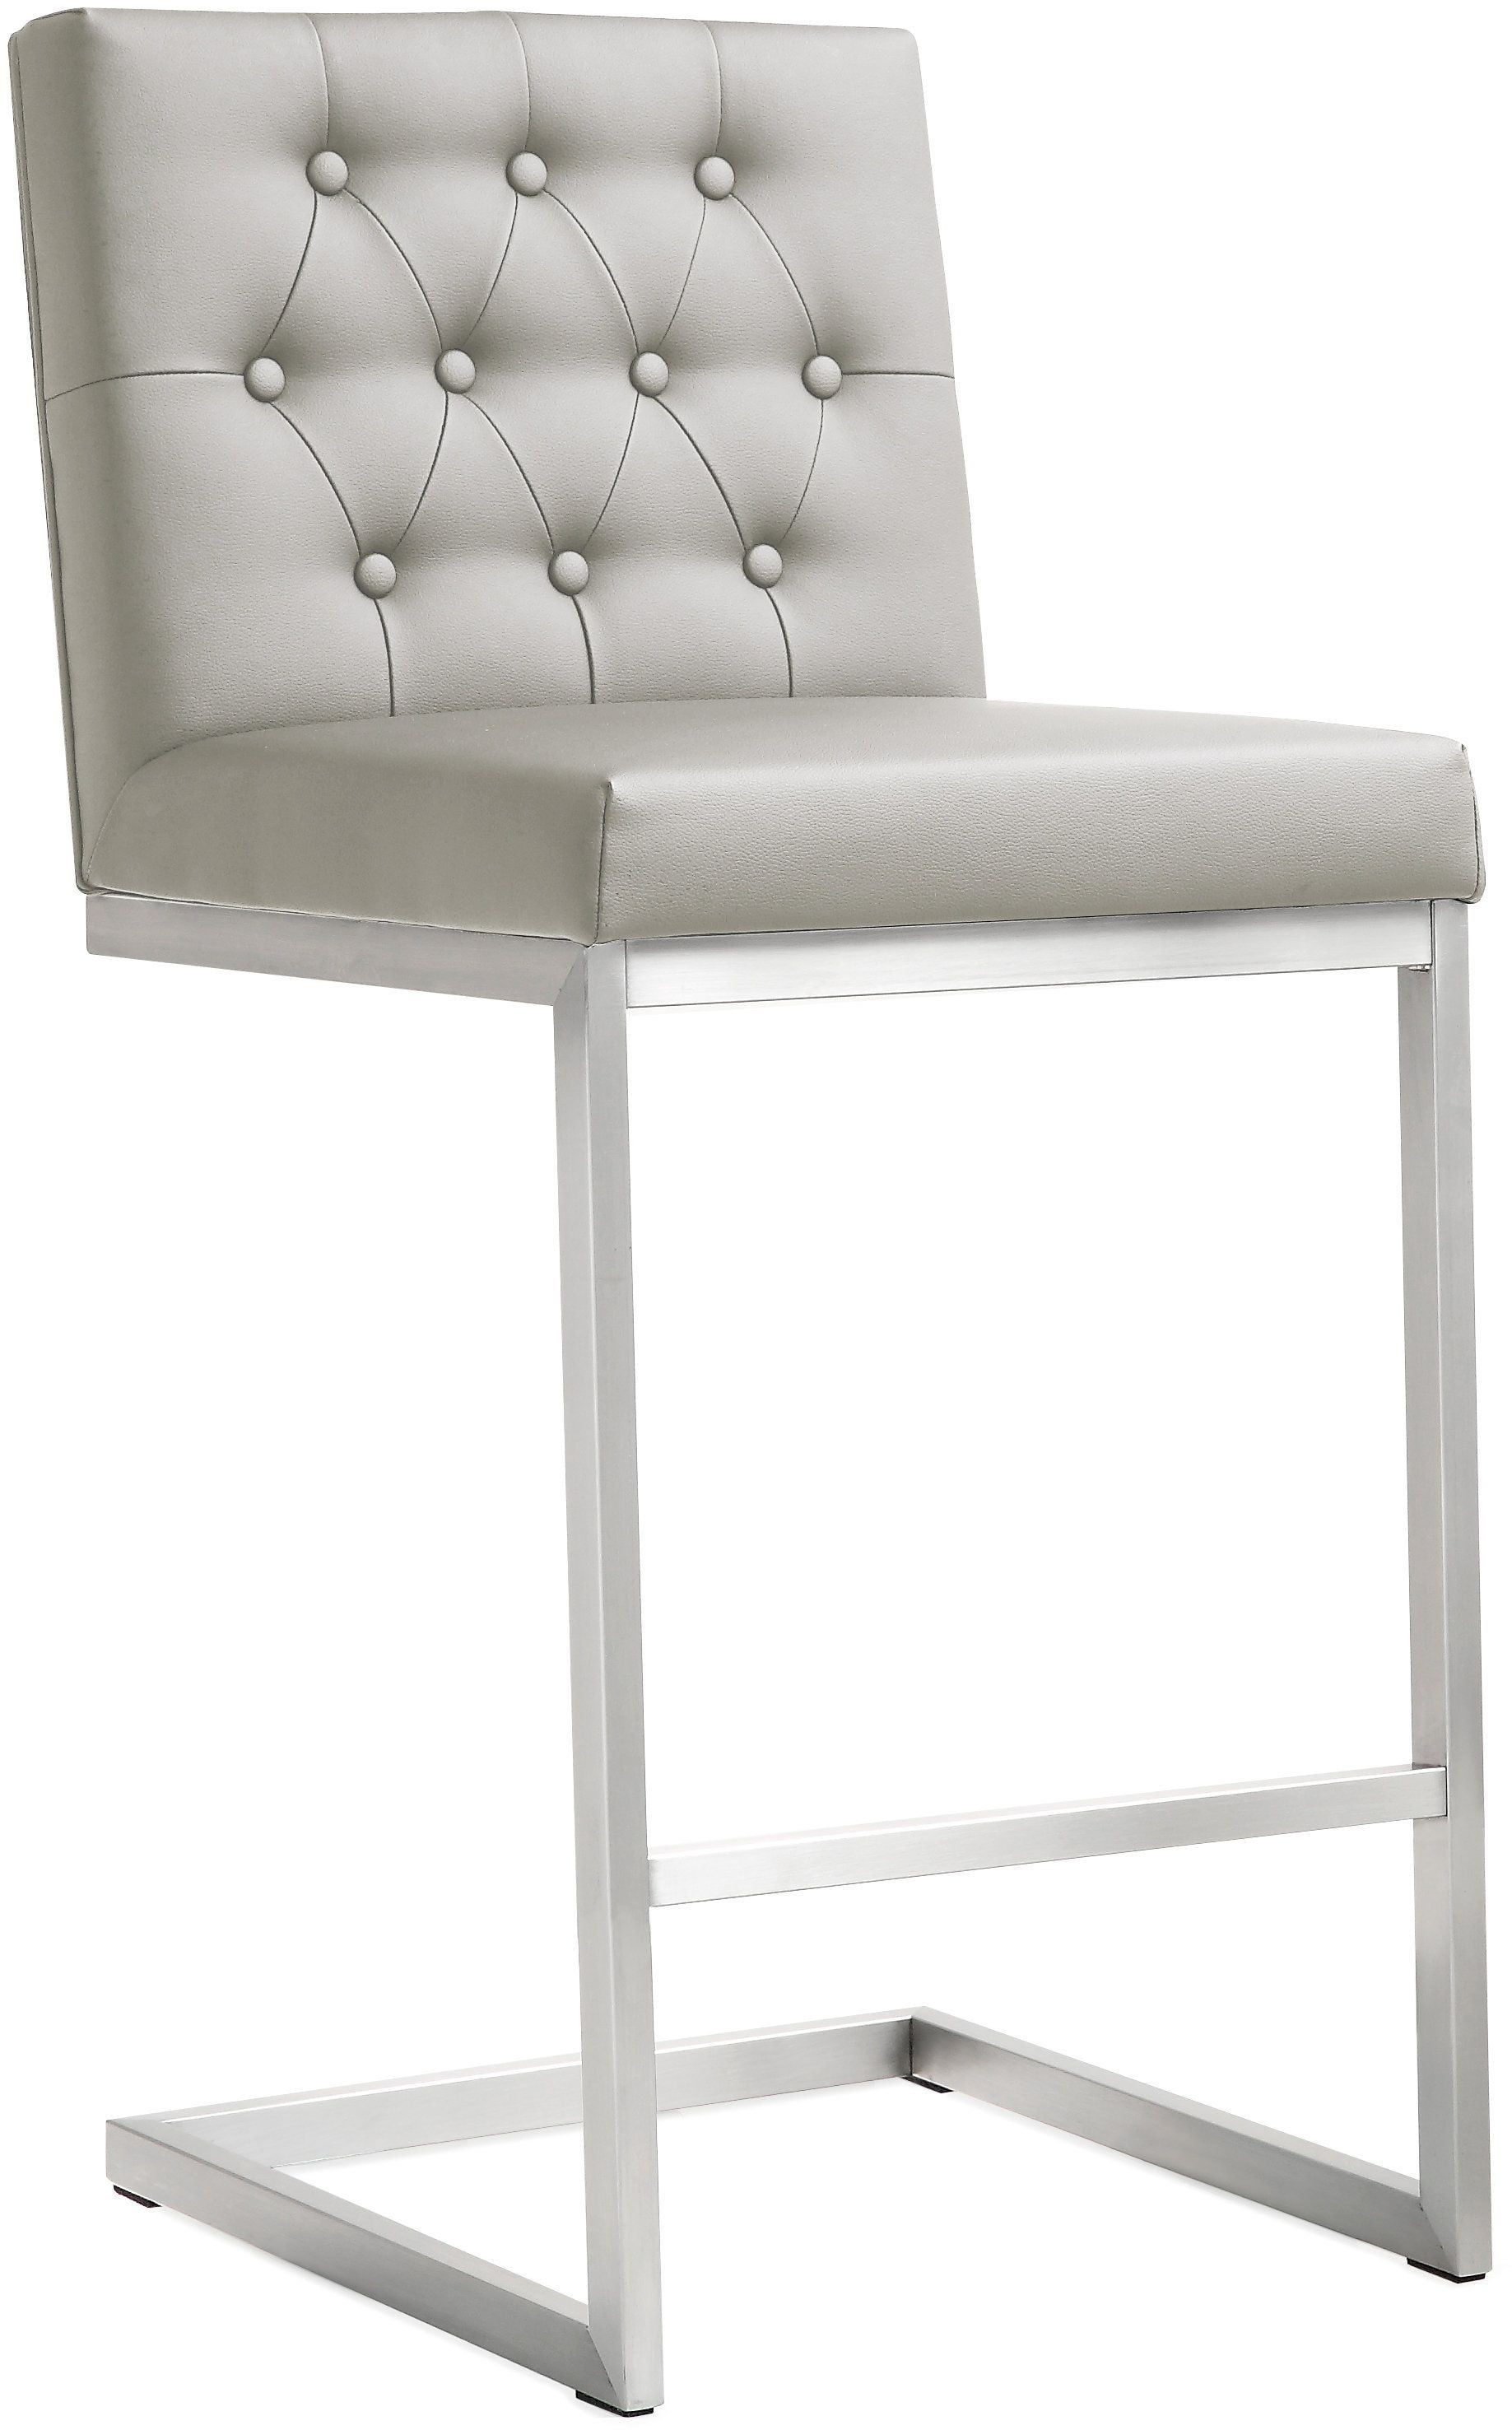 bar stool chair grey flip convertible sleeper helsinki light gray steel counter set of 2 from tov